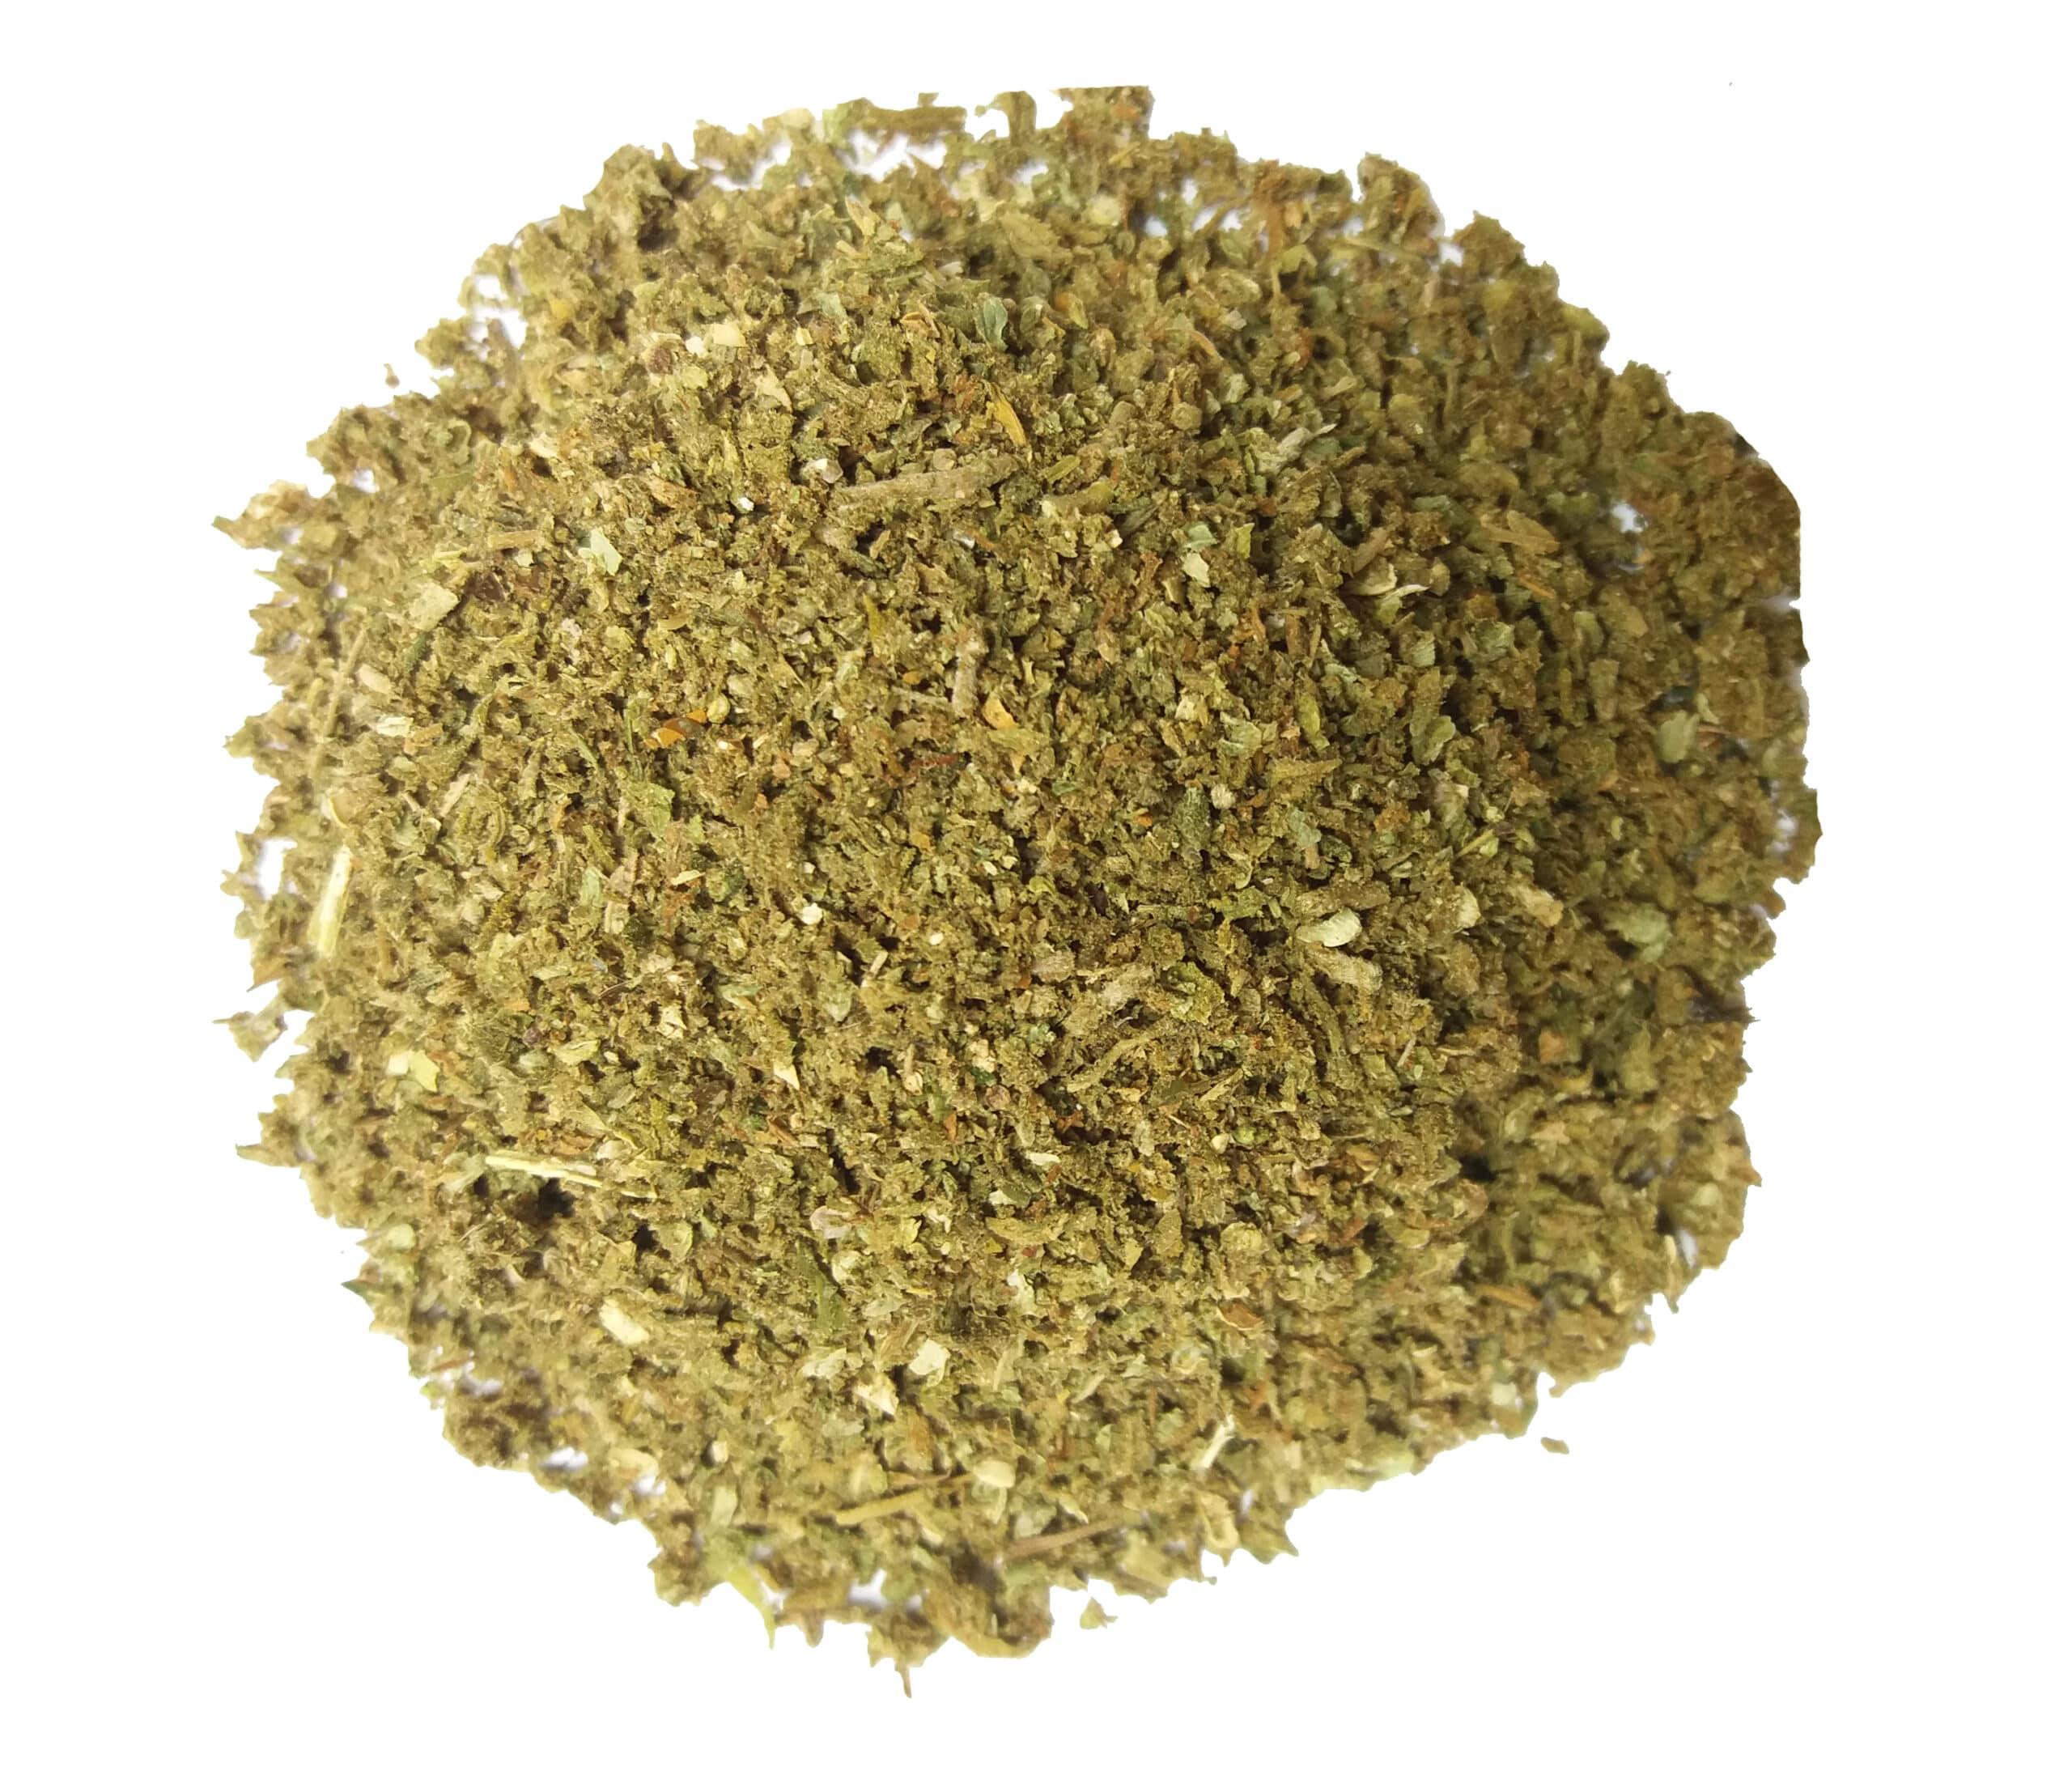 Hemp biomass